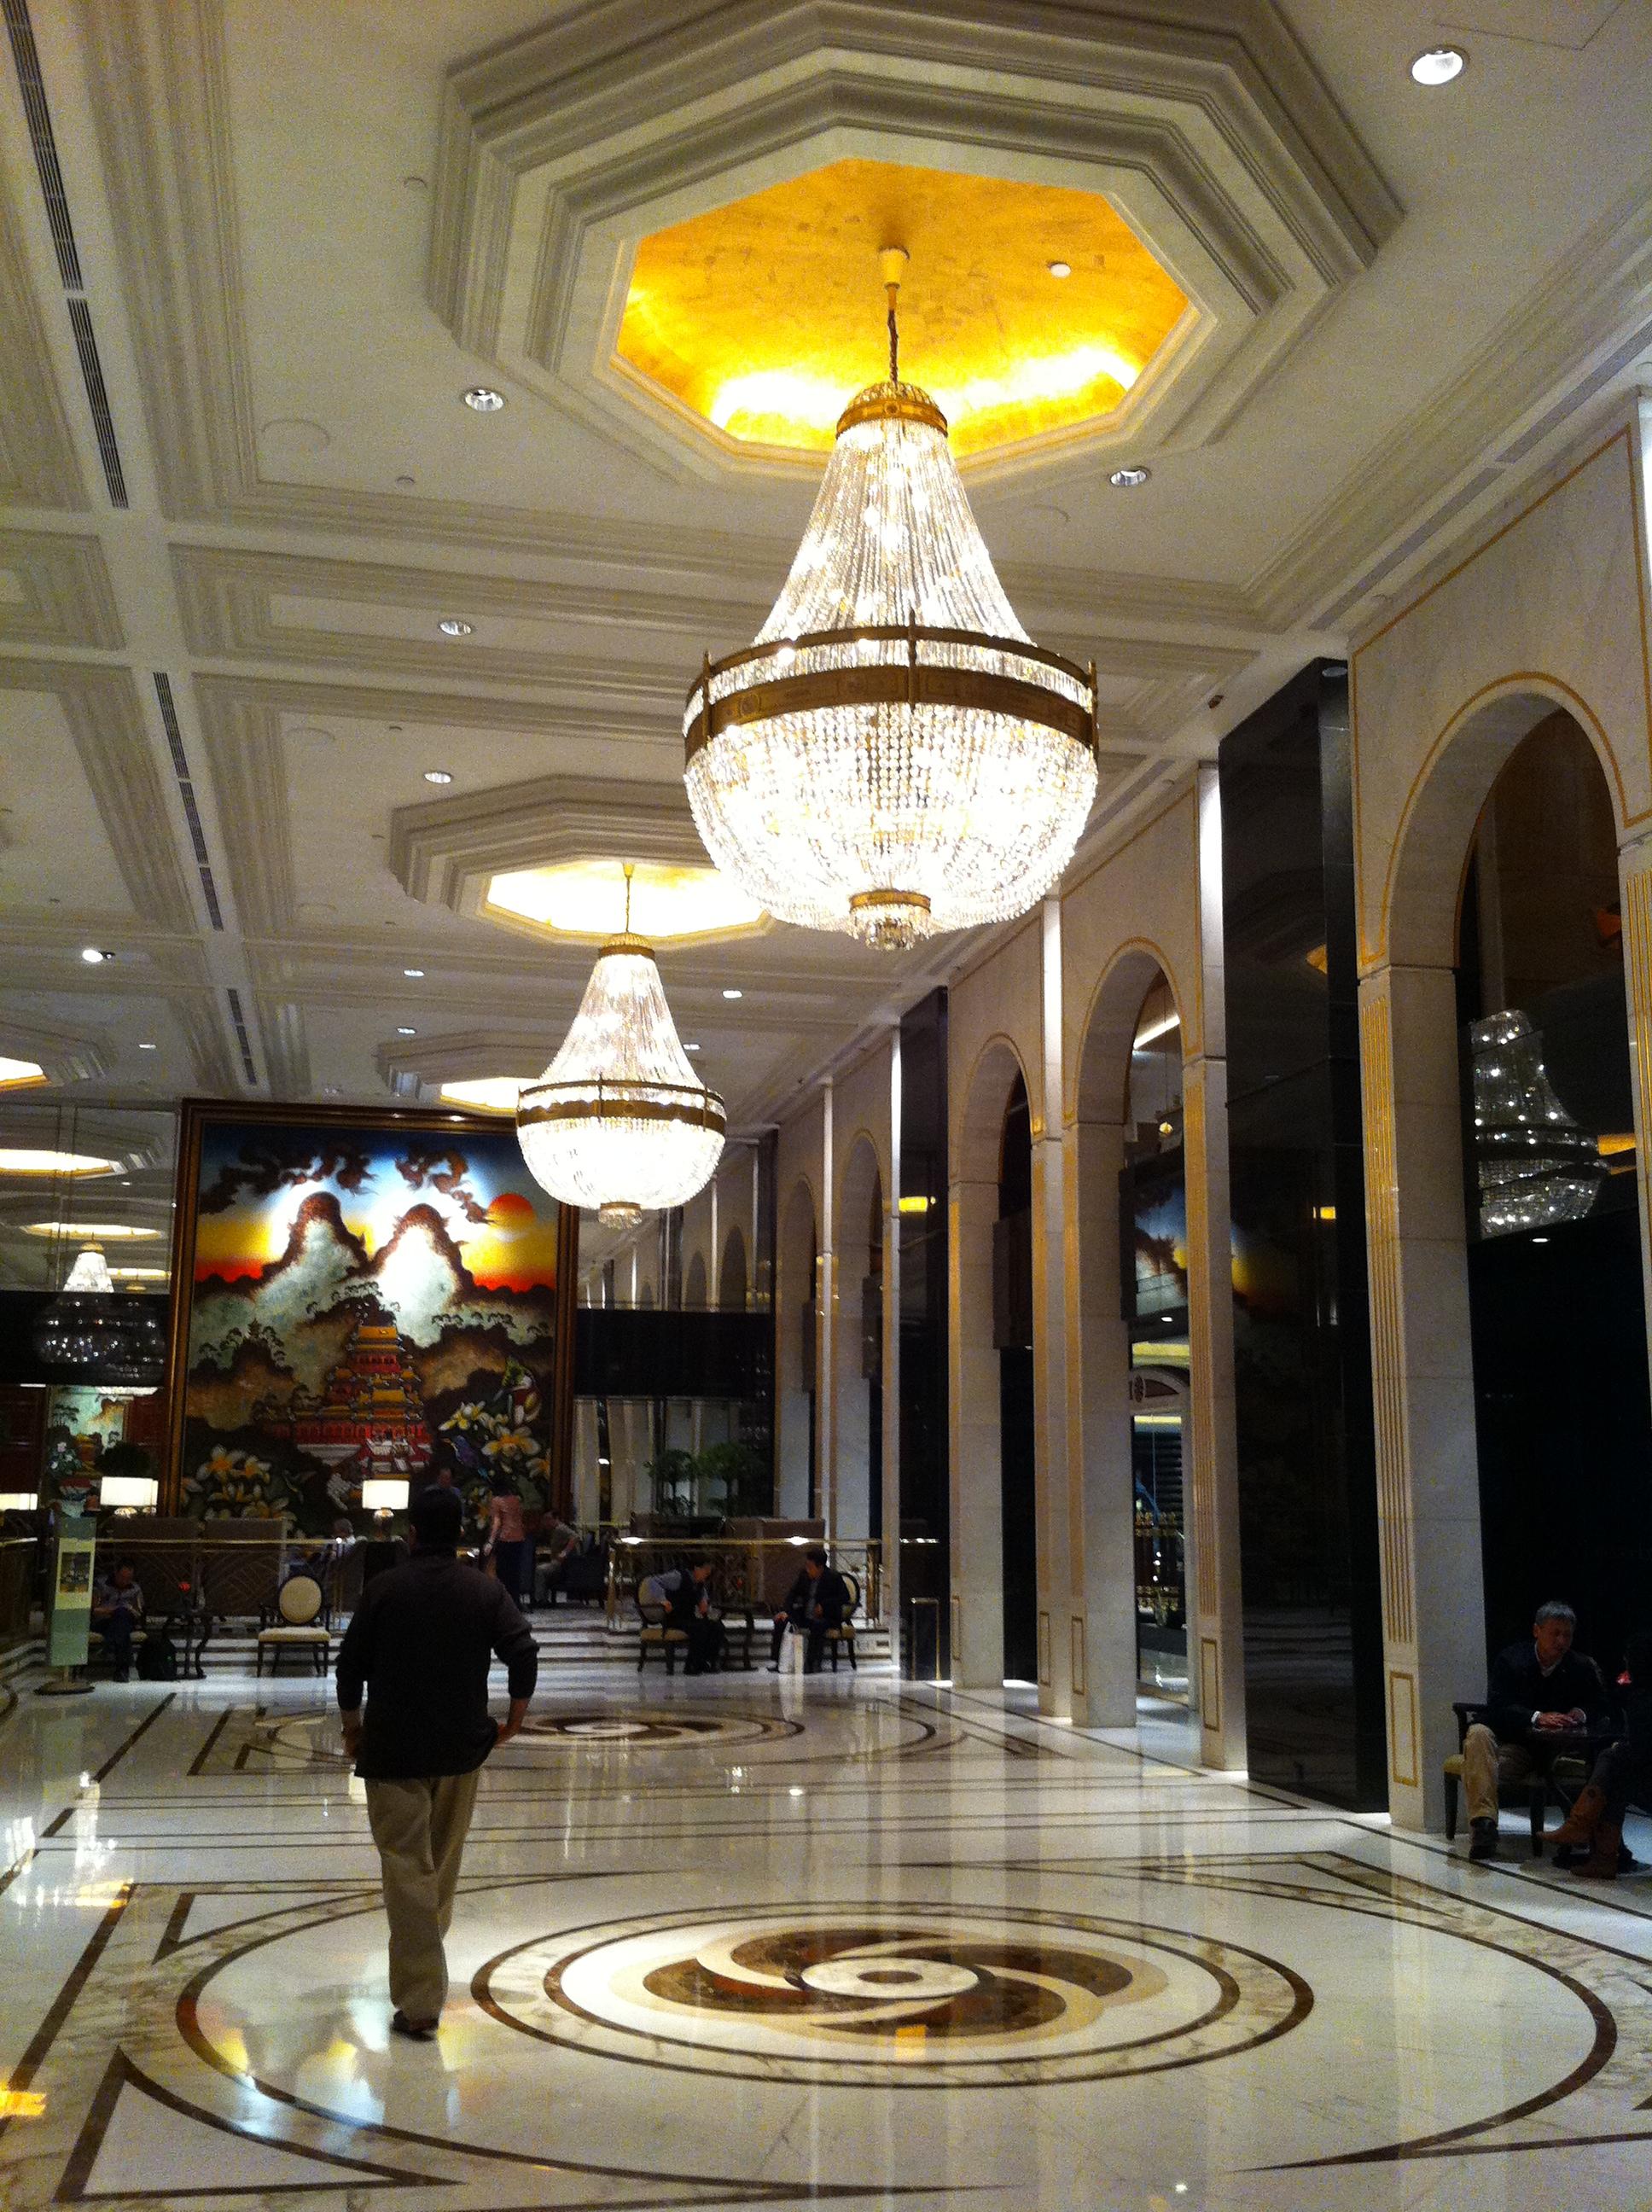 Decorative Ceiling Light Panels